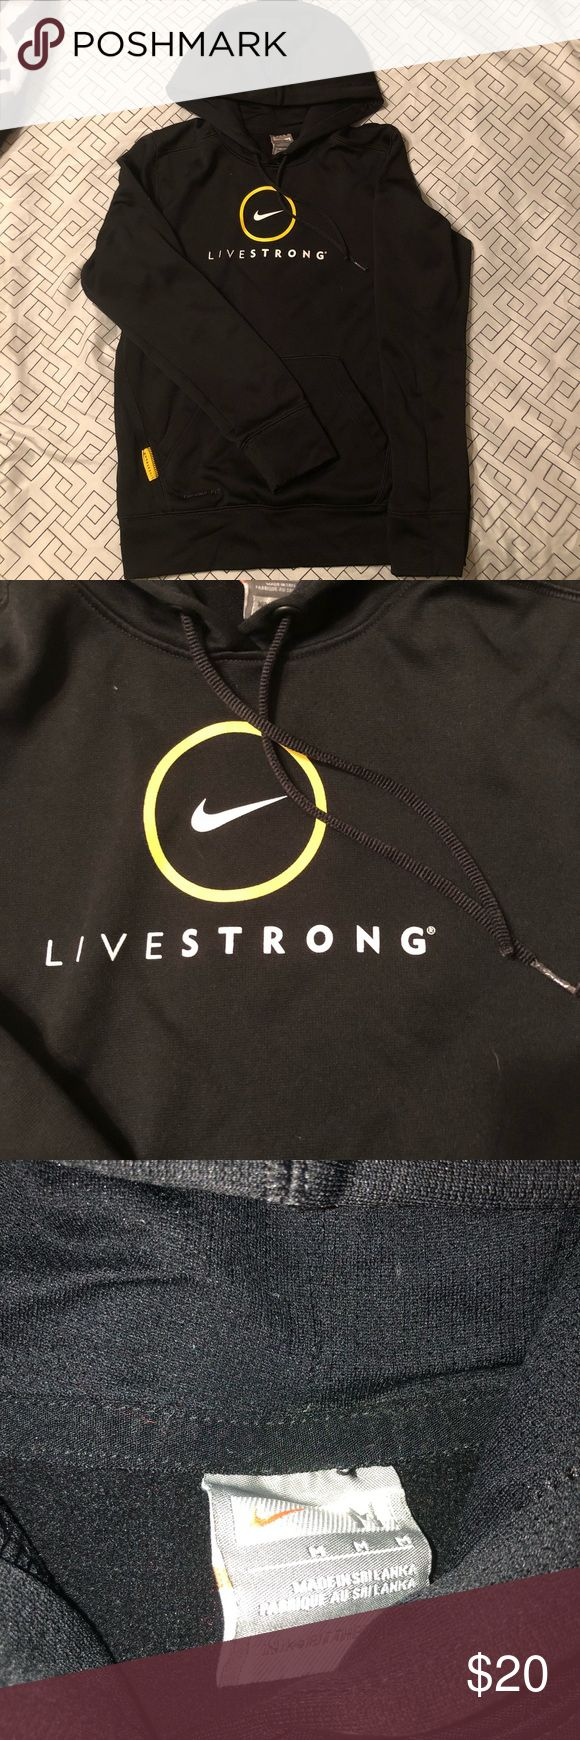 Womens size M nike livestrong hoodie Womens size medium black and yellow Nike livestrong hoodie Nike Tops Sweatshirts & Hoodies